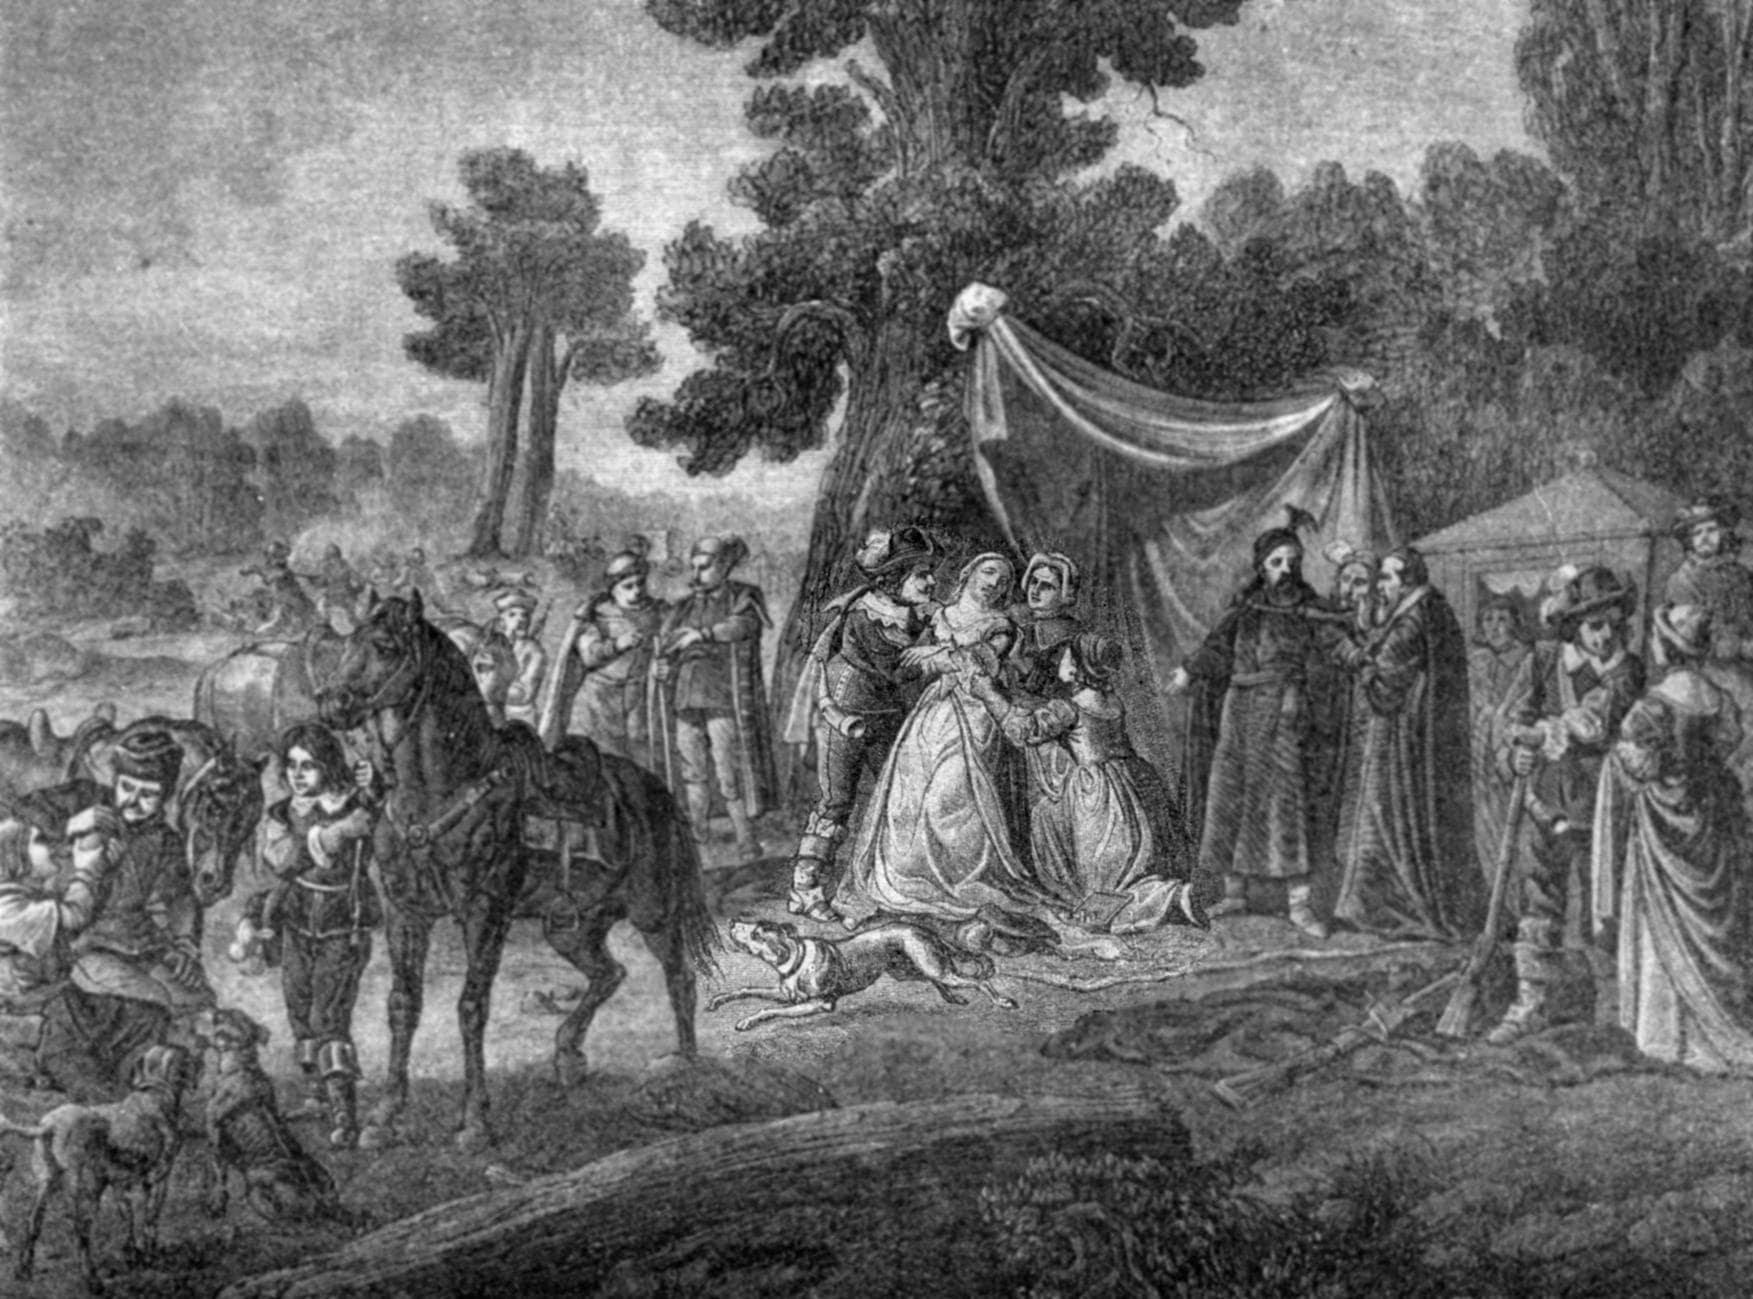 Король Владислав IV на охоте в Пуще